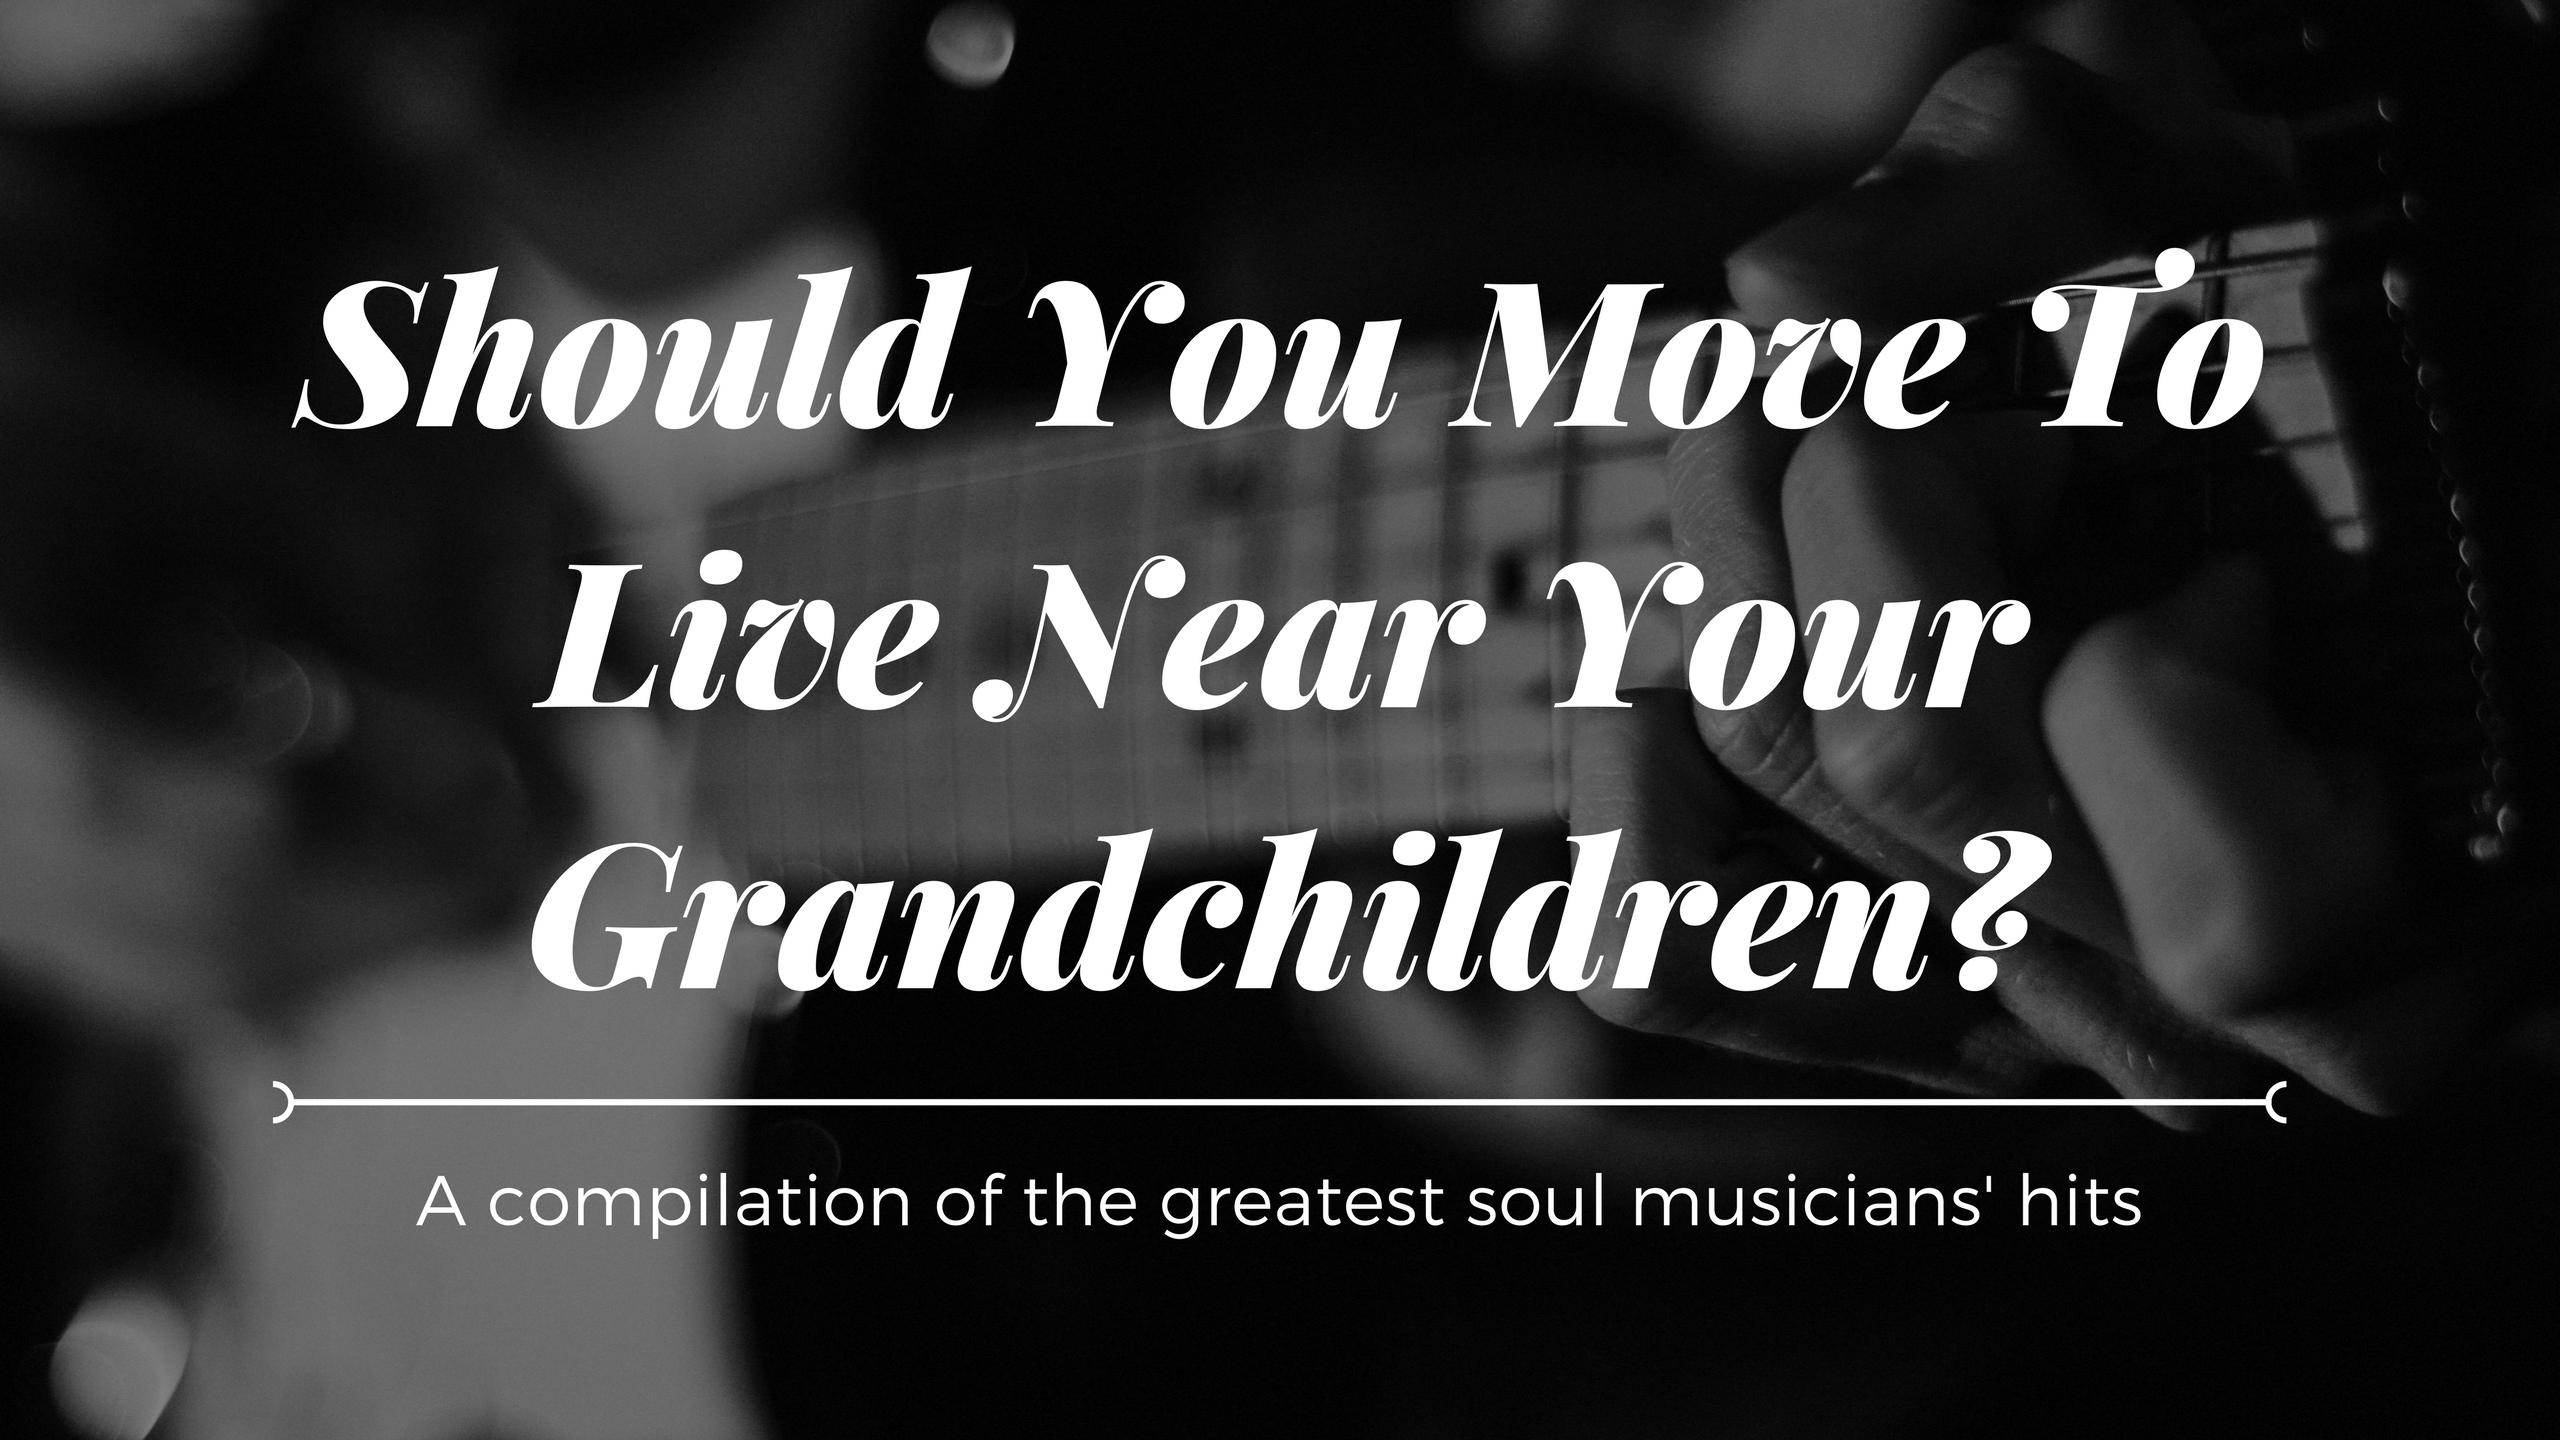 Live Near Your Grandchildren